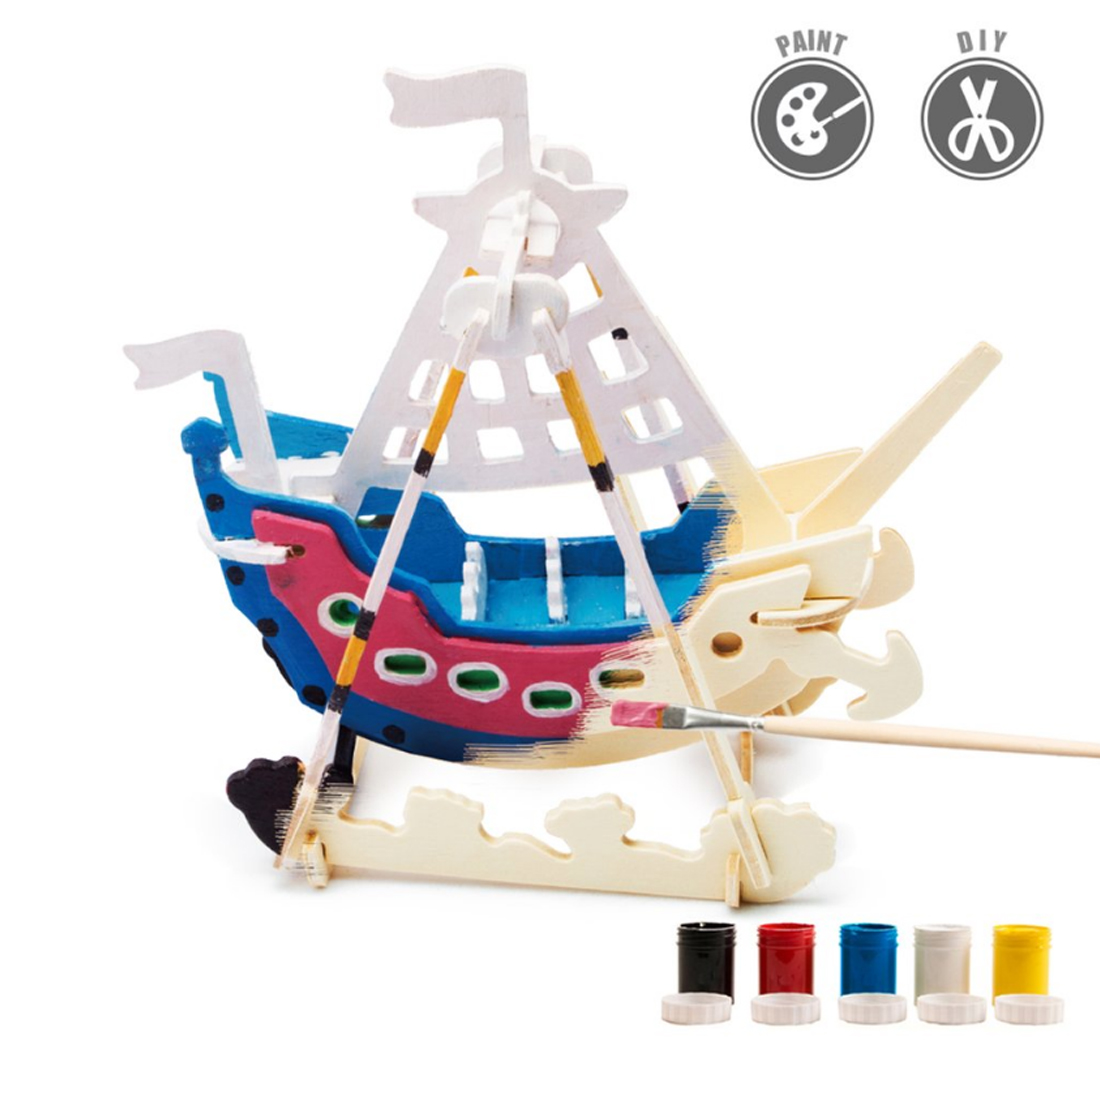 Toys & Hobbies Creative Swing Boat Shape 3d Painting Puzzle Diy Assemble Stem Toys With 5-color Pigment Kids Parent Interation Time